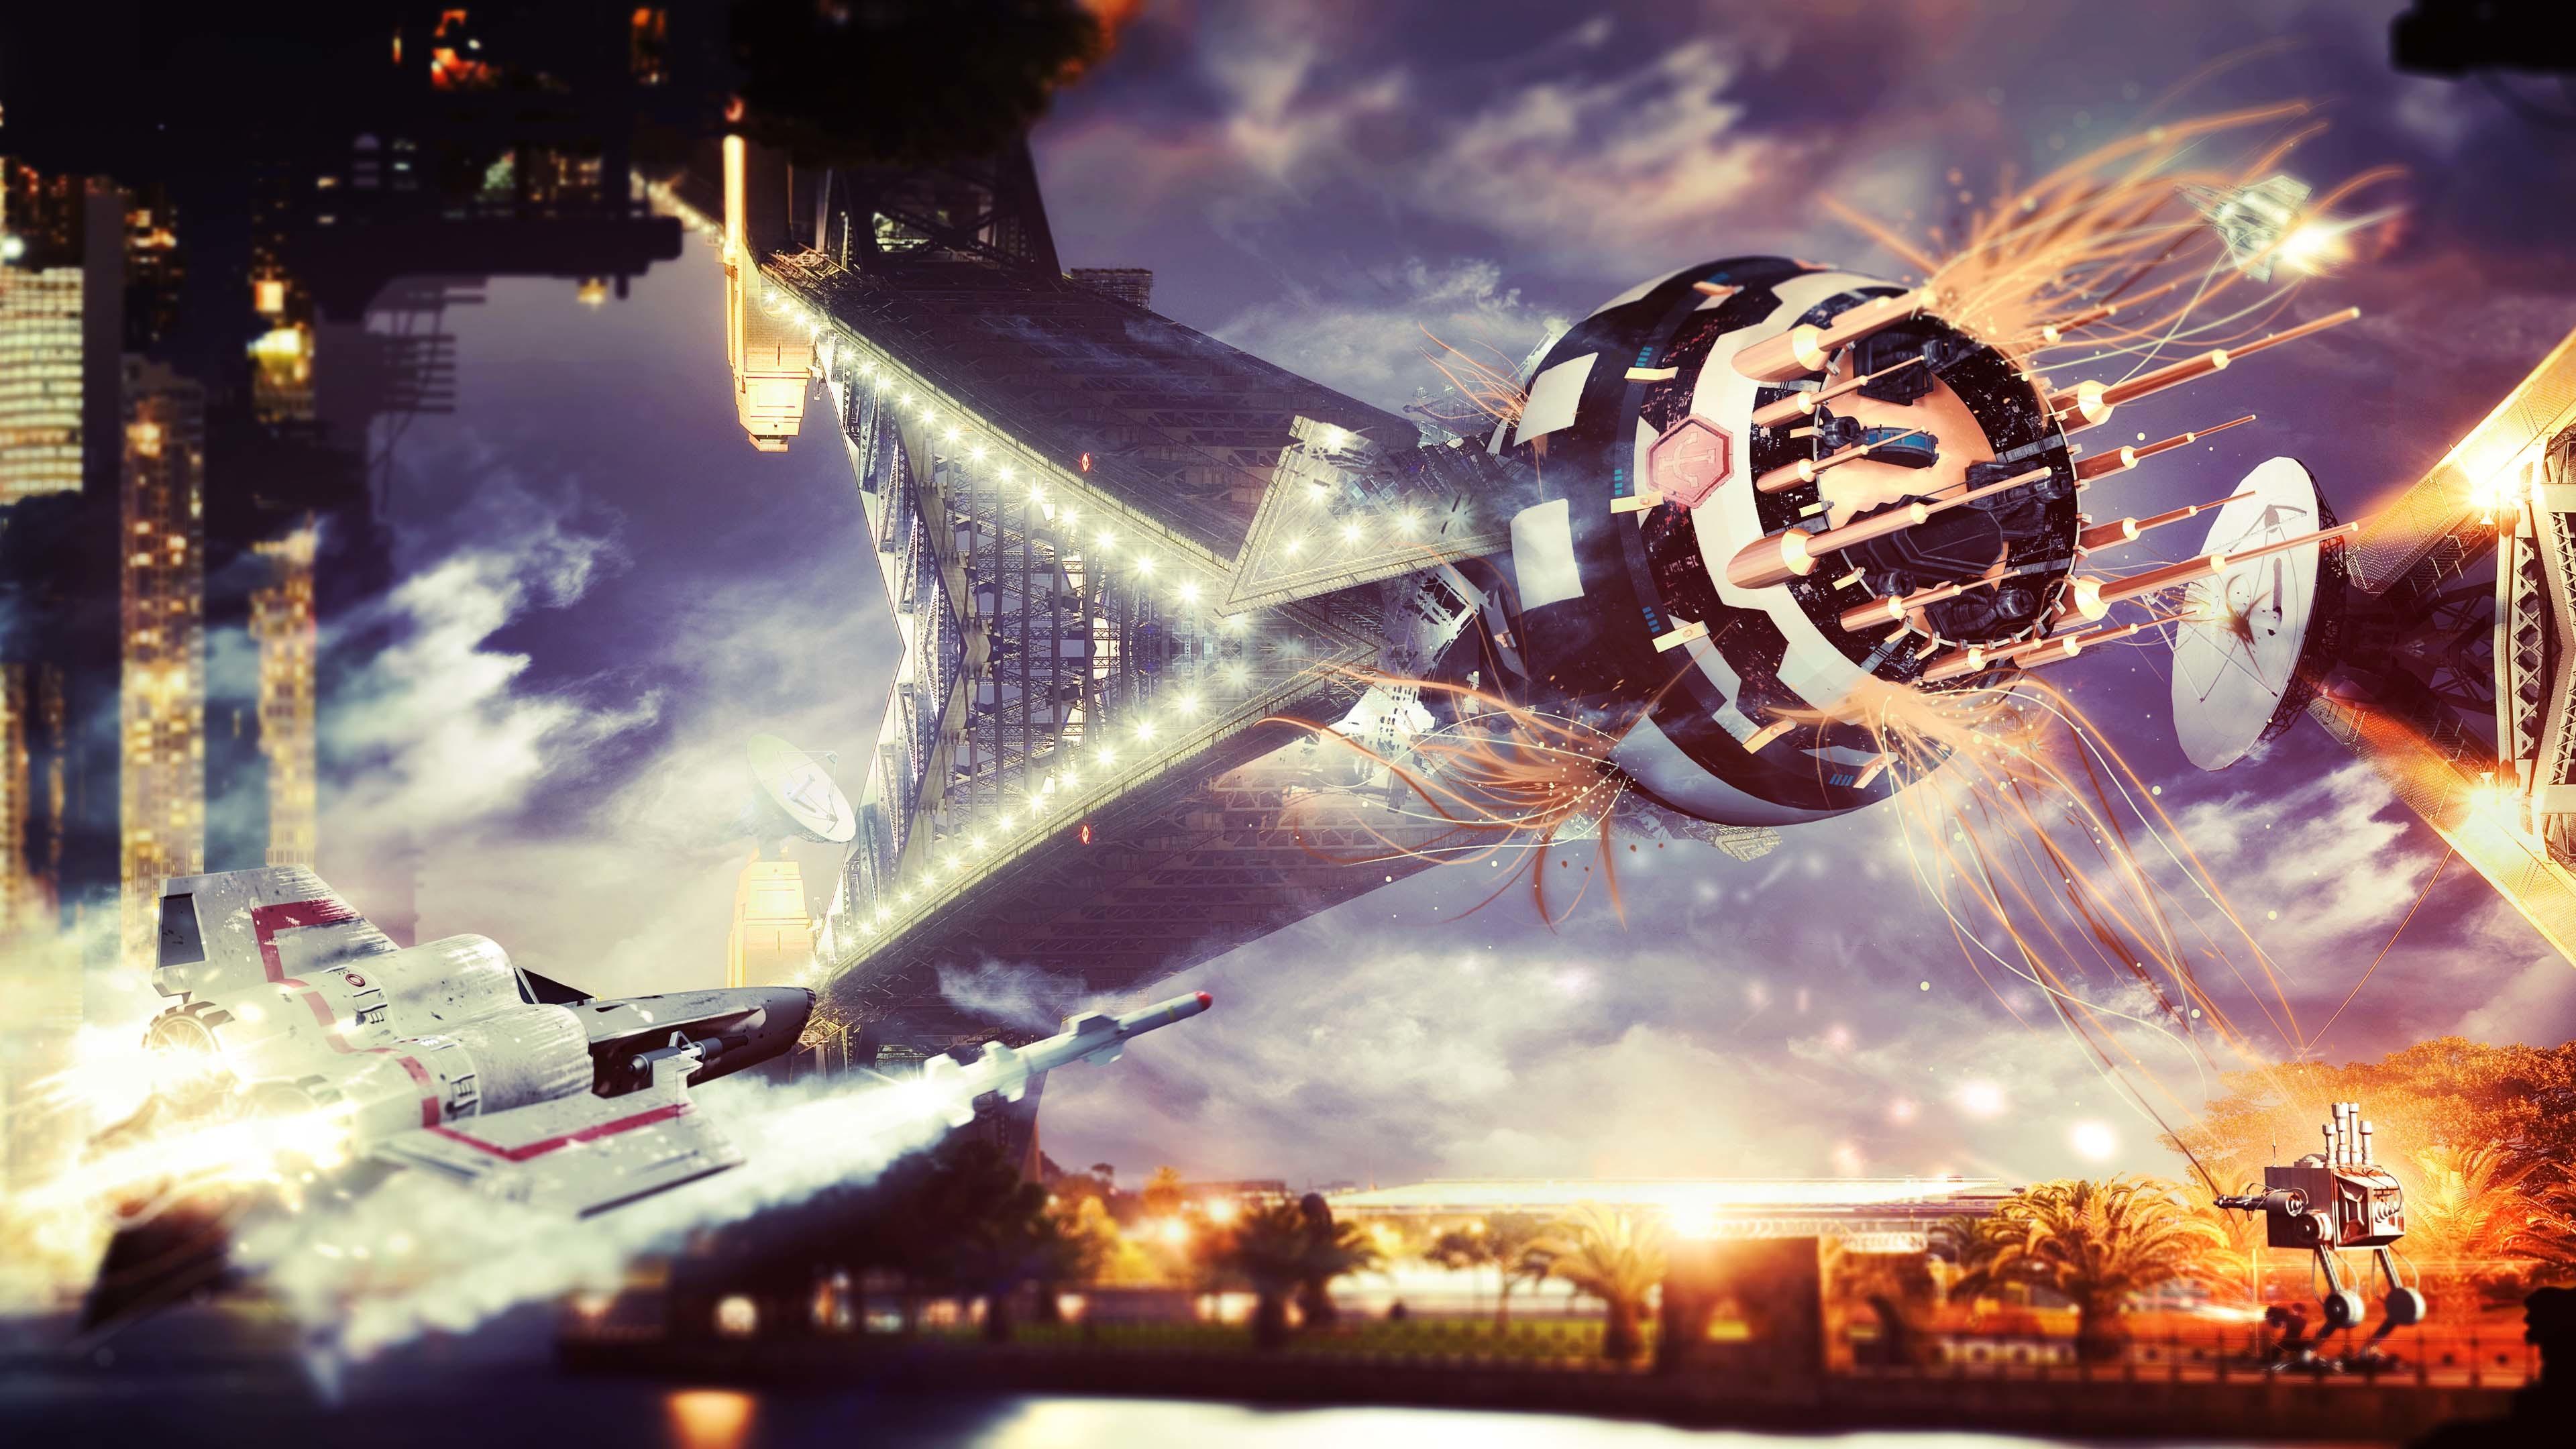 4K HD Wallpaper: Science Fiction Vision